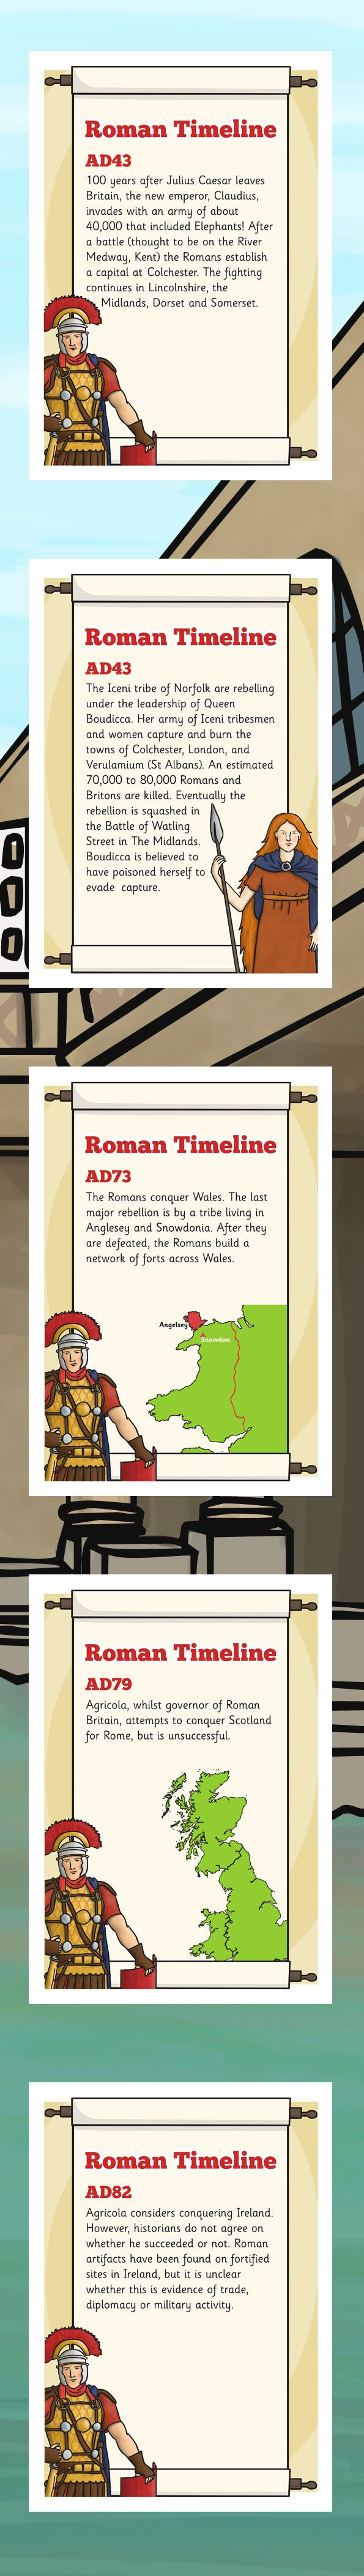 KS2 History Timelines- Roman Timeline Posters